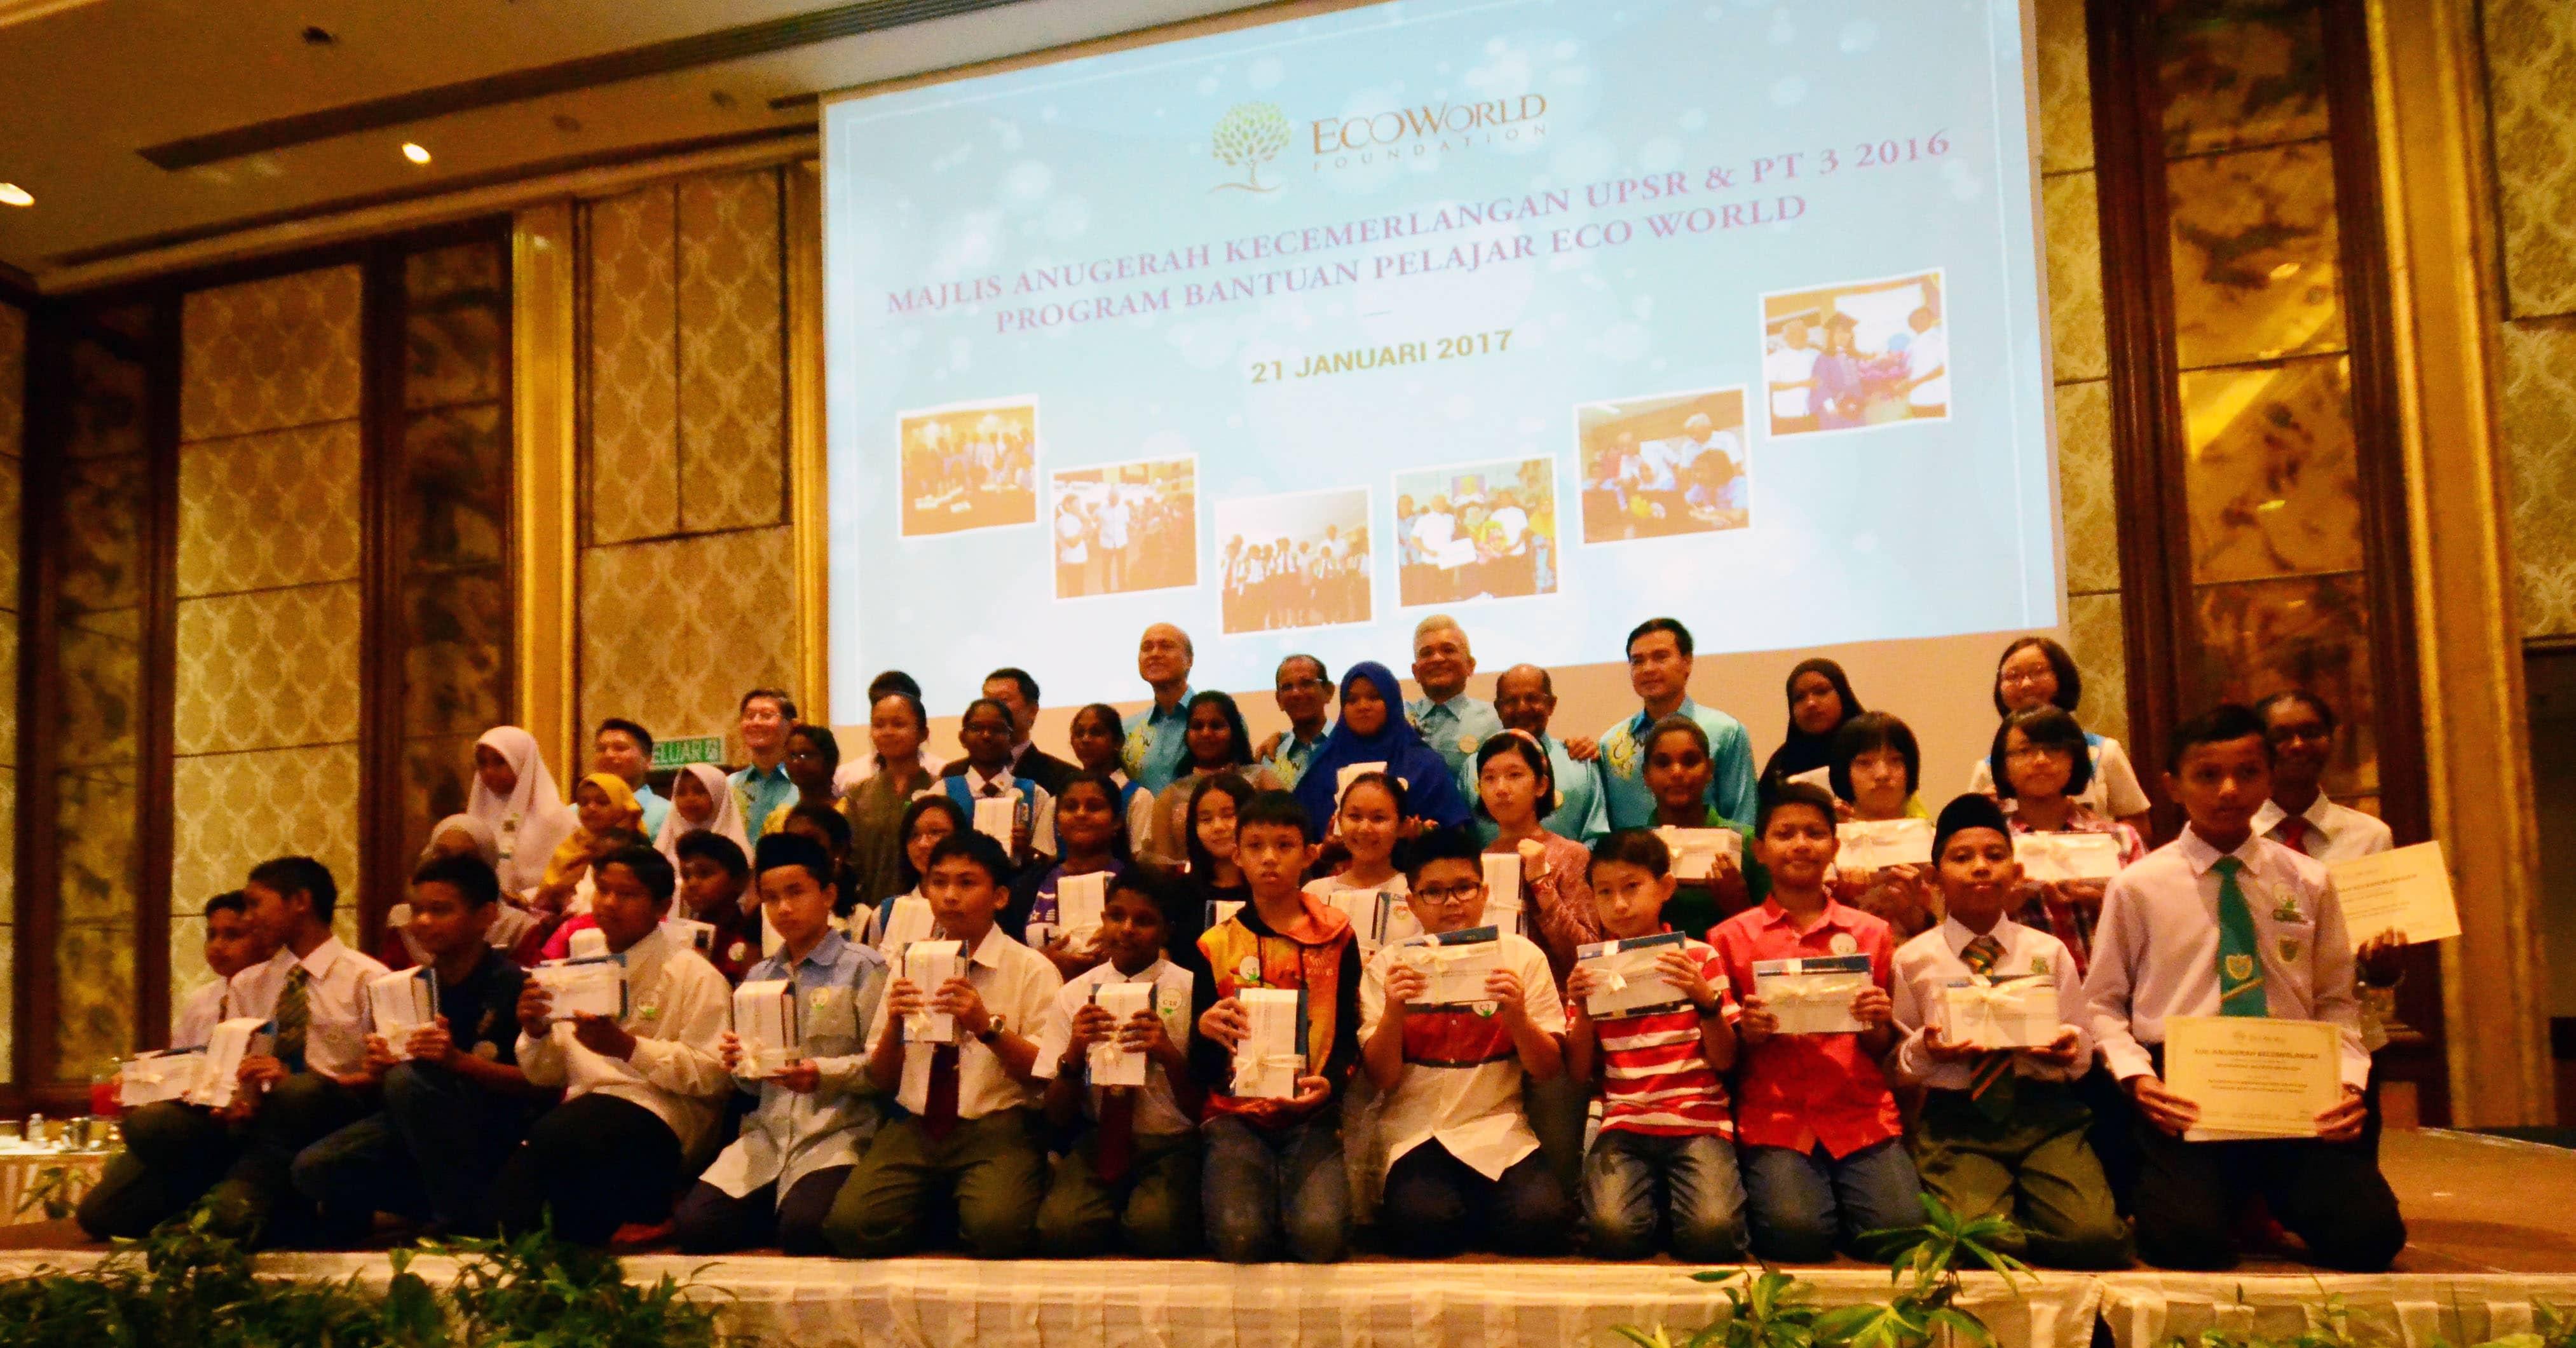 EcoWorld慈善基金会小六UPSR考试和初中三PT3考试学生成绩卓越颁奖典礼